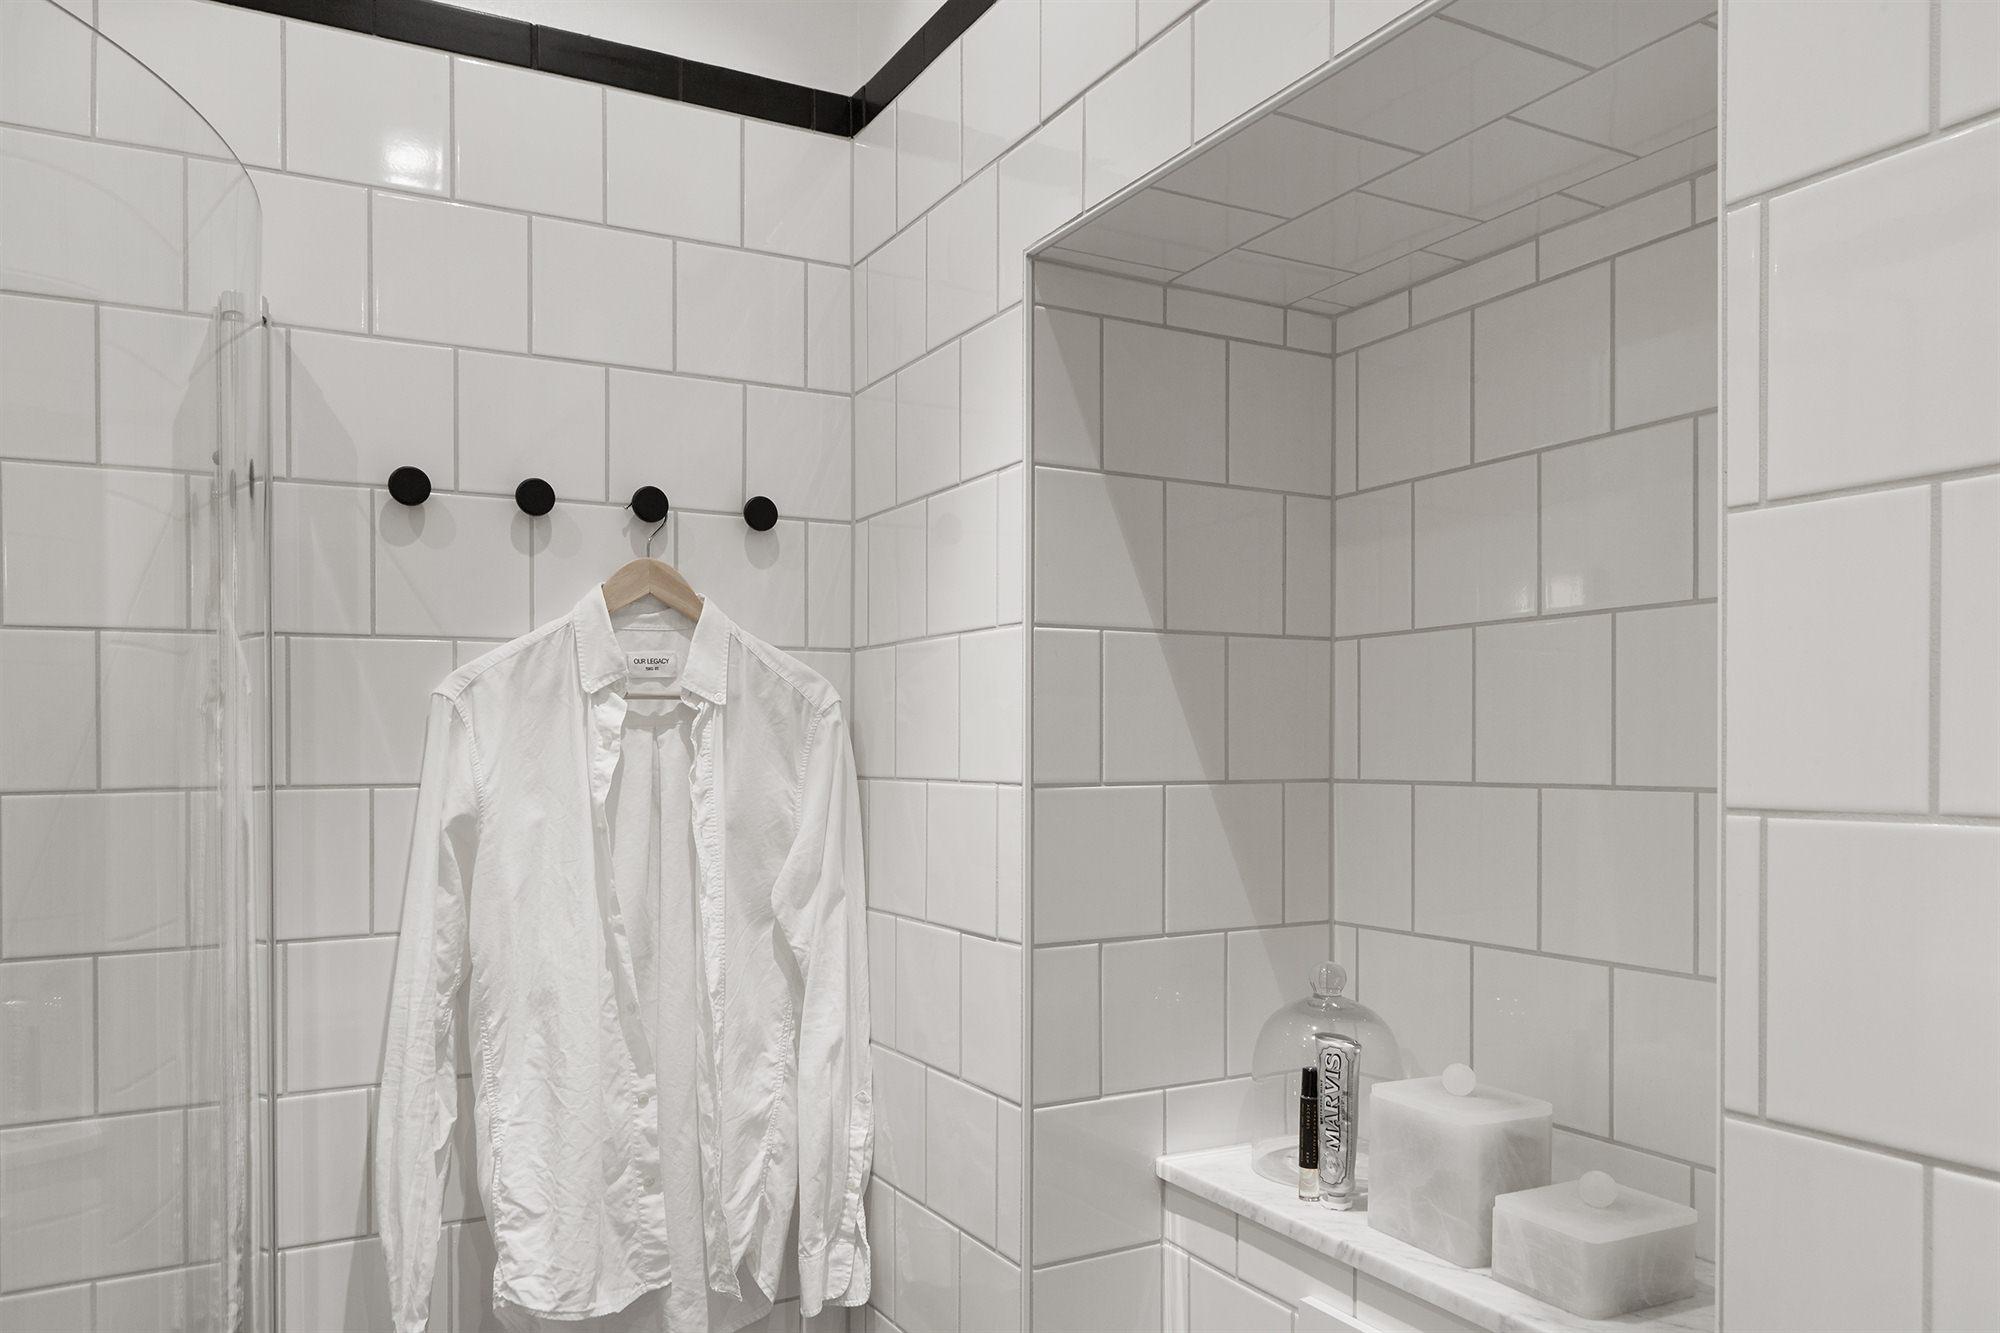 Hexagon Tegels Wit : Zelfklevende tegels badkamer badkamer tegels wit hexagon tegels